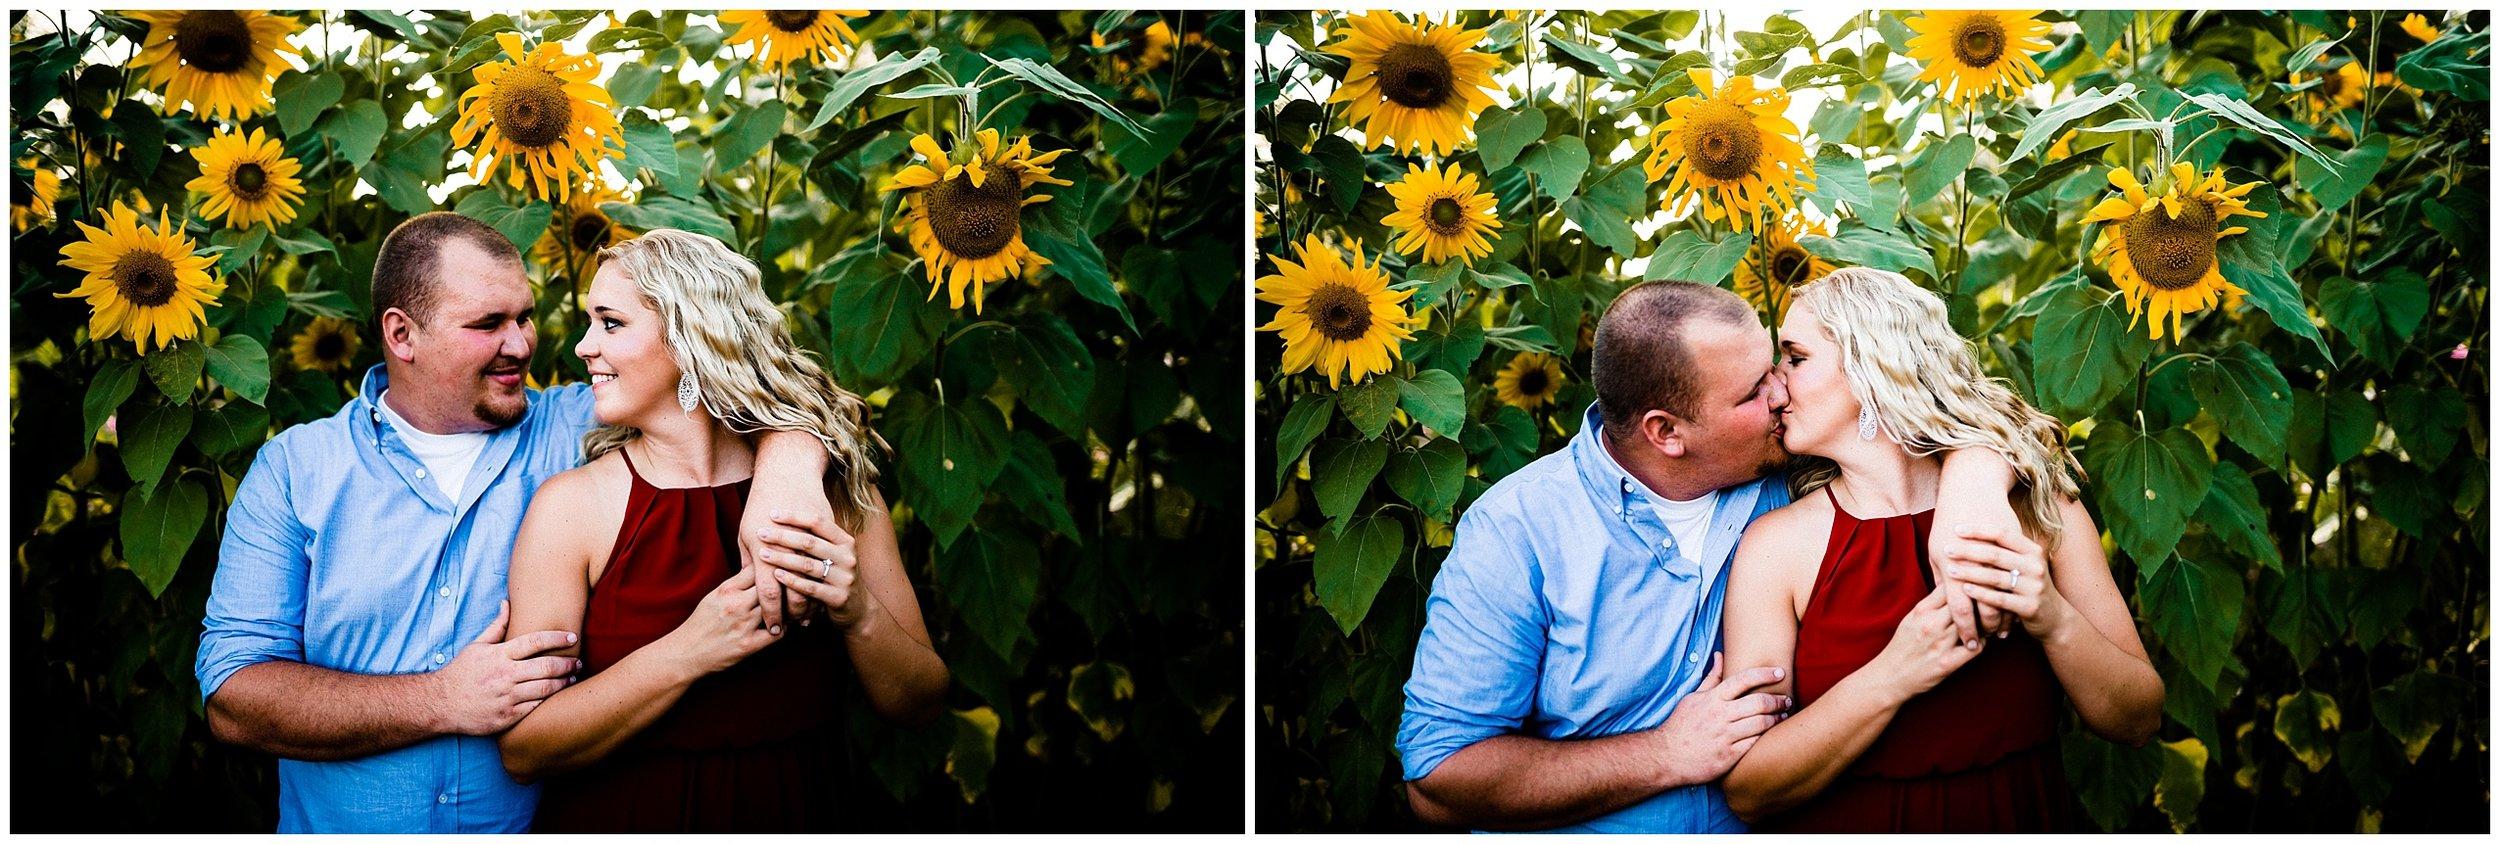 Nate + Tamryn | Engaged #kyleepaigephotography_1034.jpg